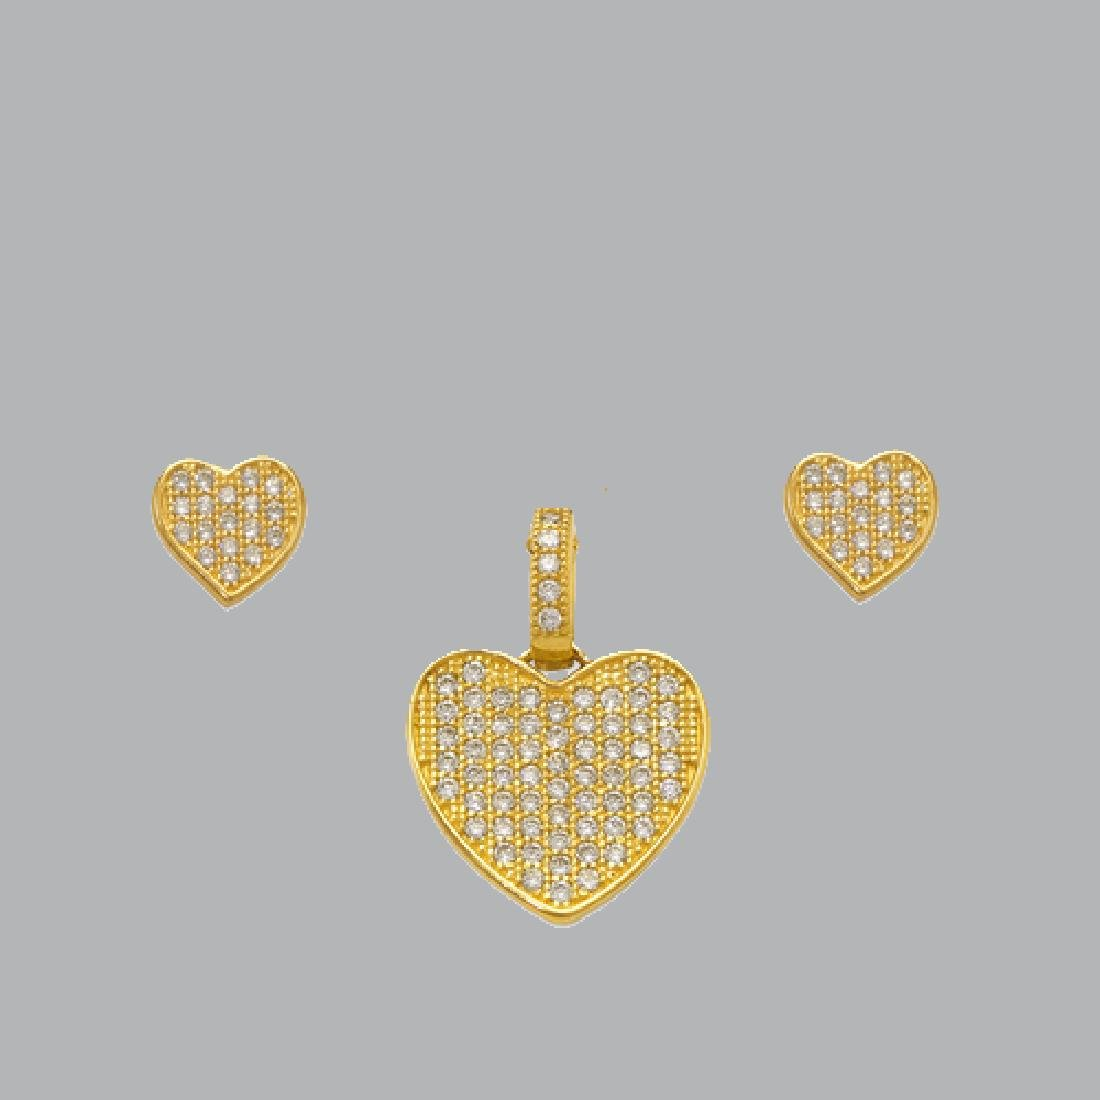 NEW 14K YELLOW GOLD HEART EARRING PENDANT SET